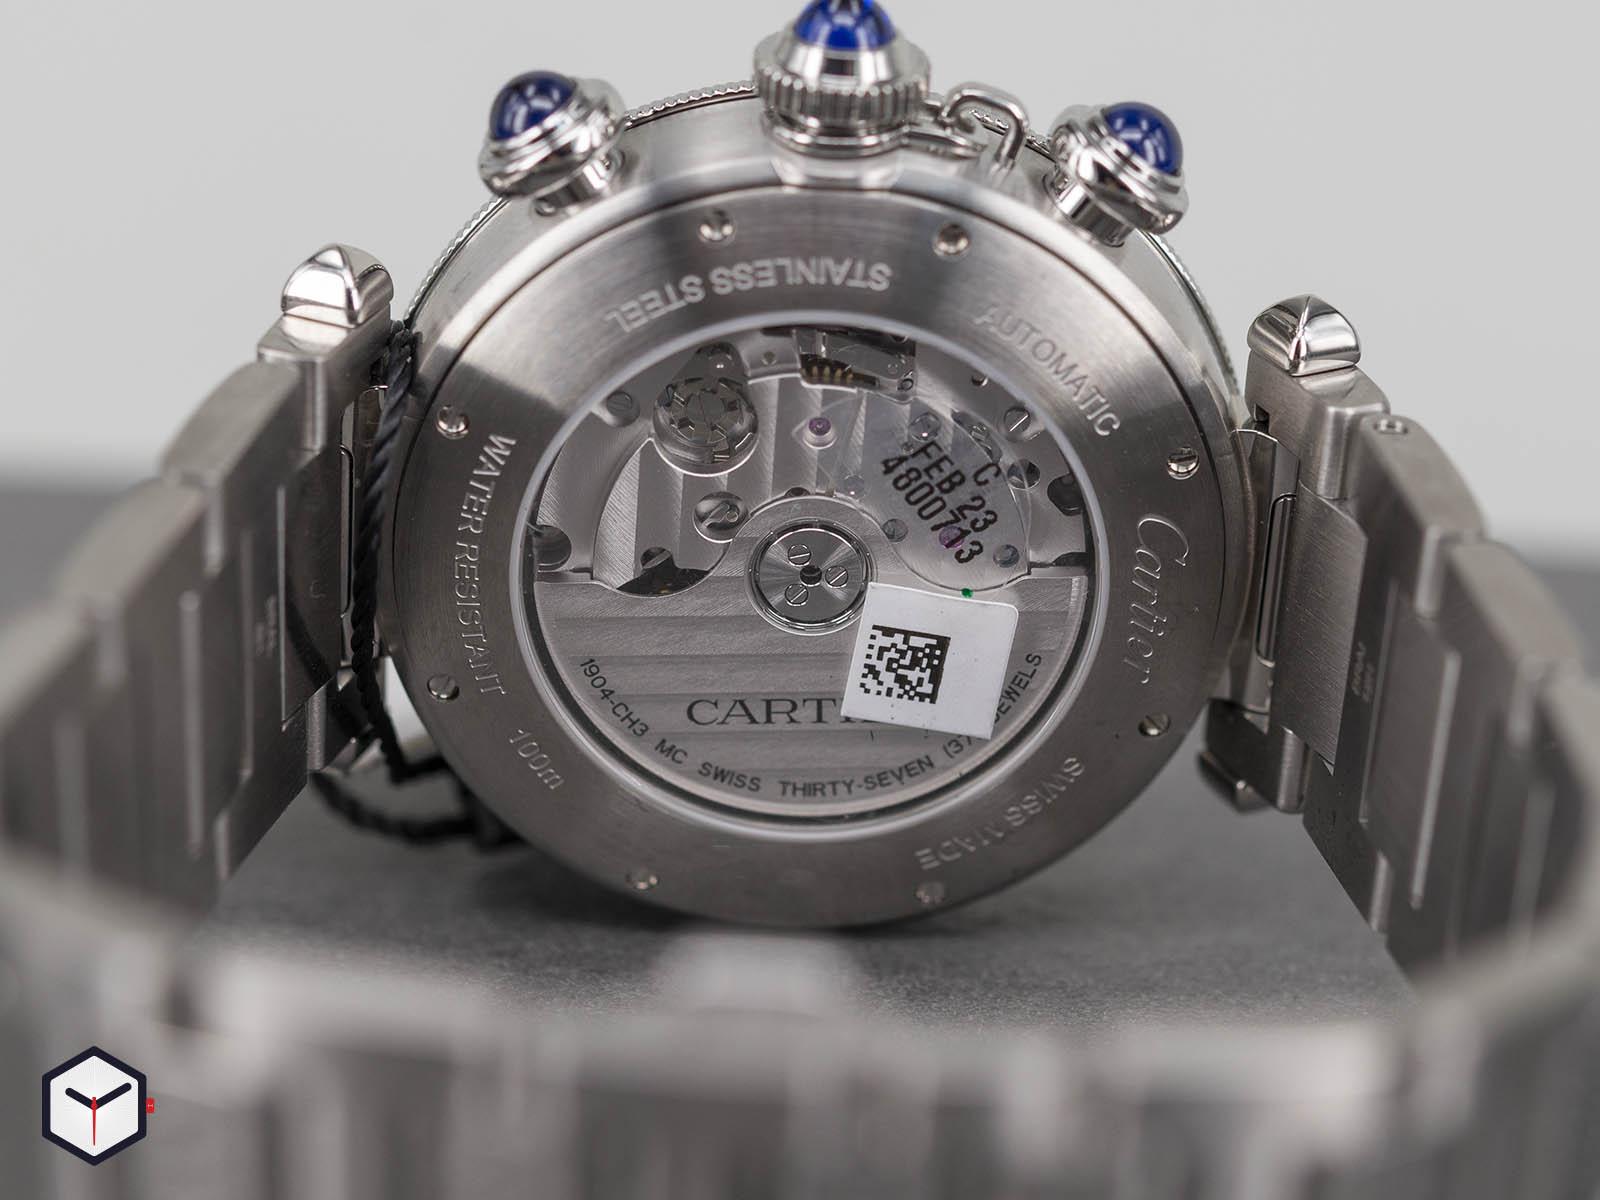 cartier-pasha-de-cartier-41mm-chronograph-l-6.jpg